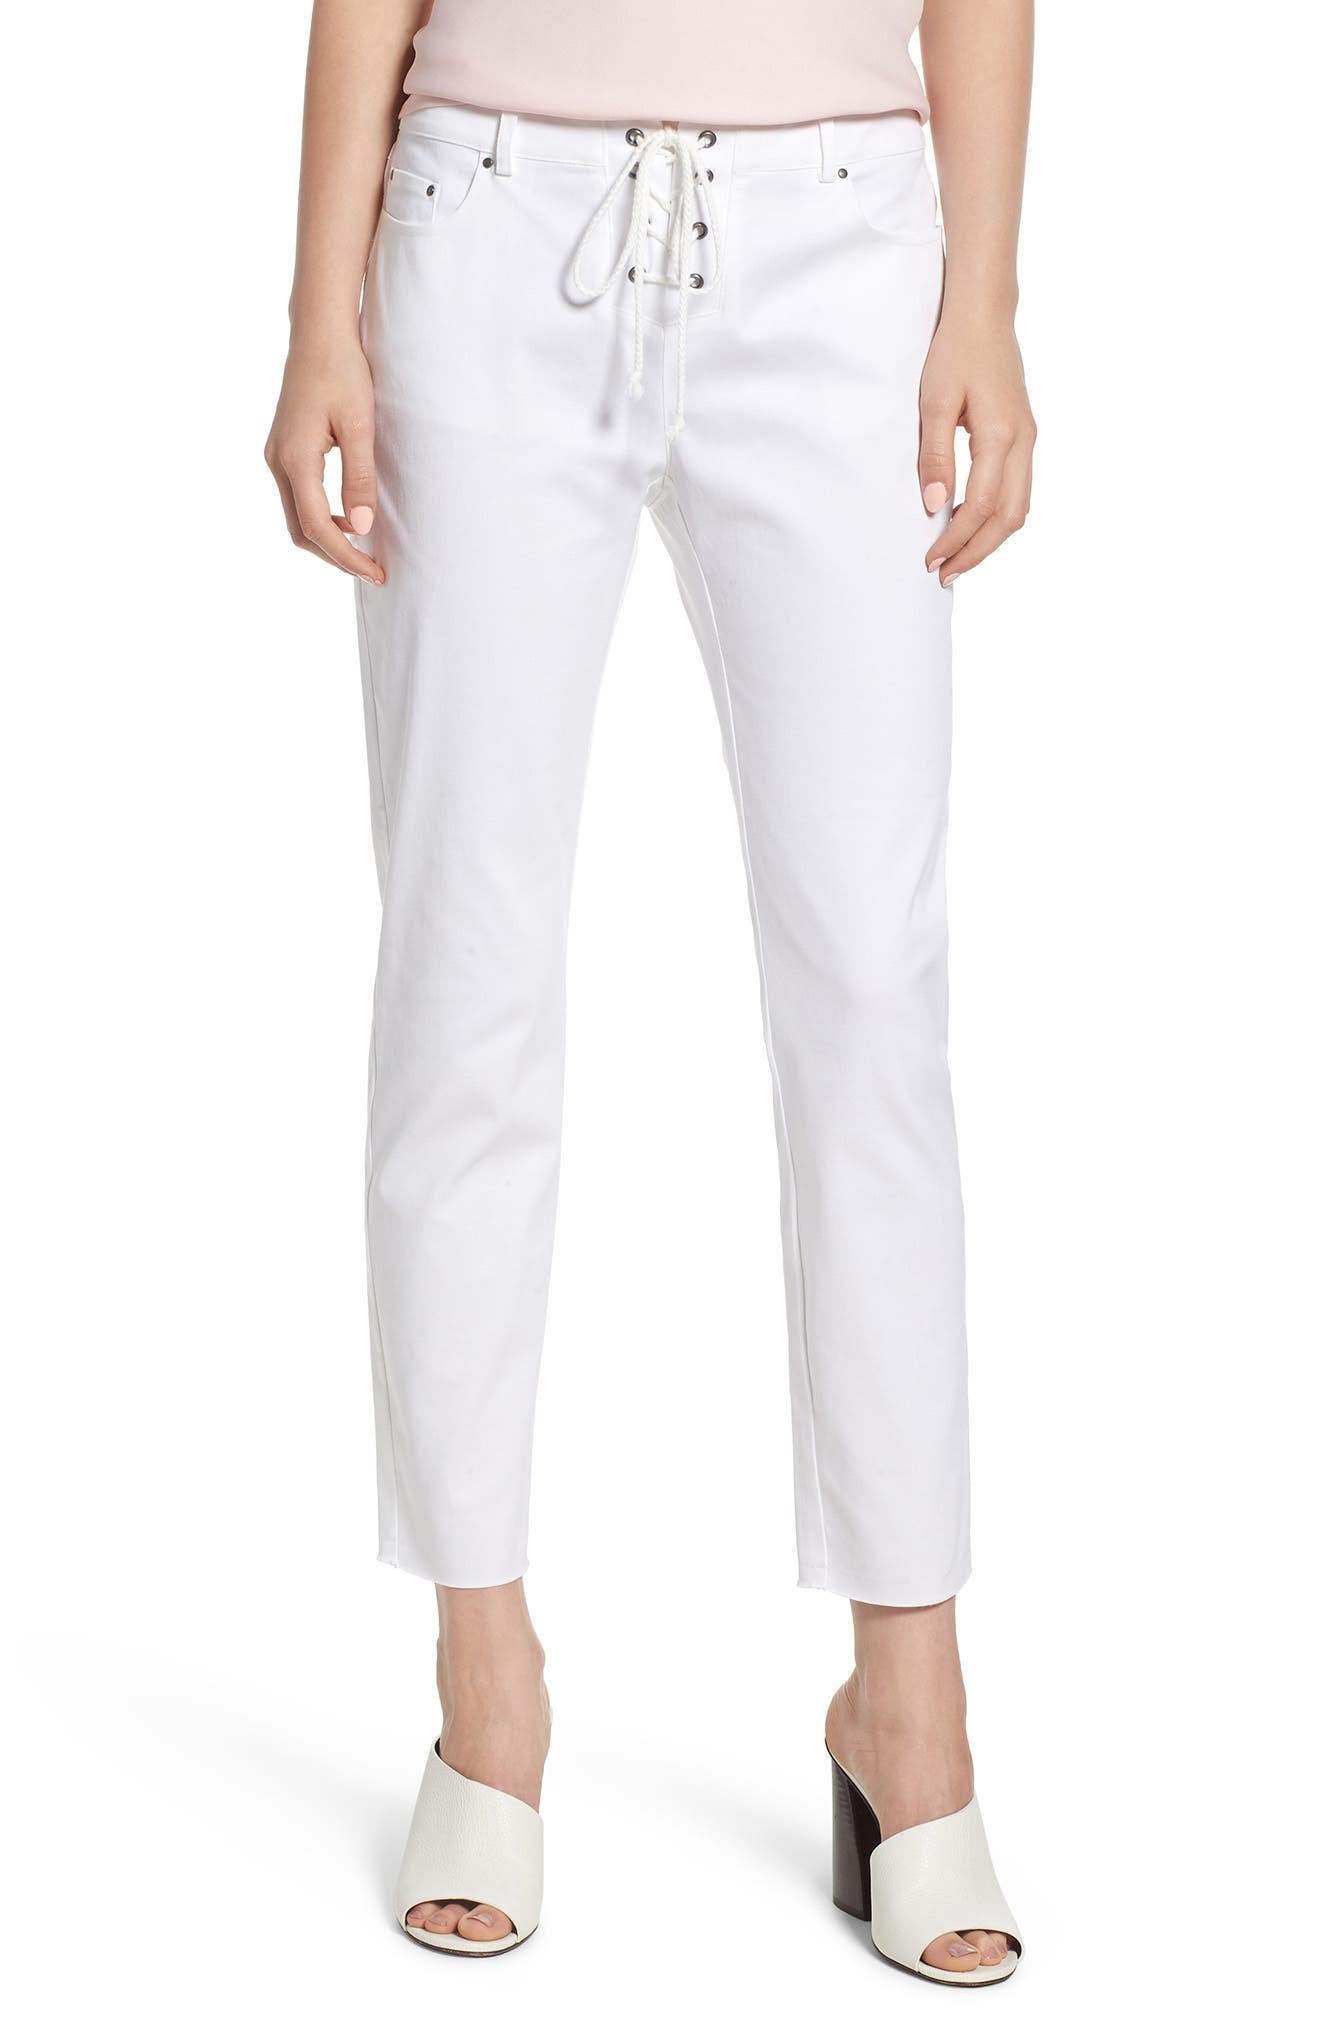 Jalanda Pants,                             Main thumbnail 1, color,                             White